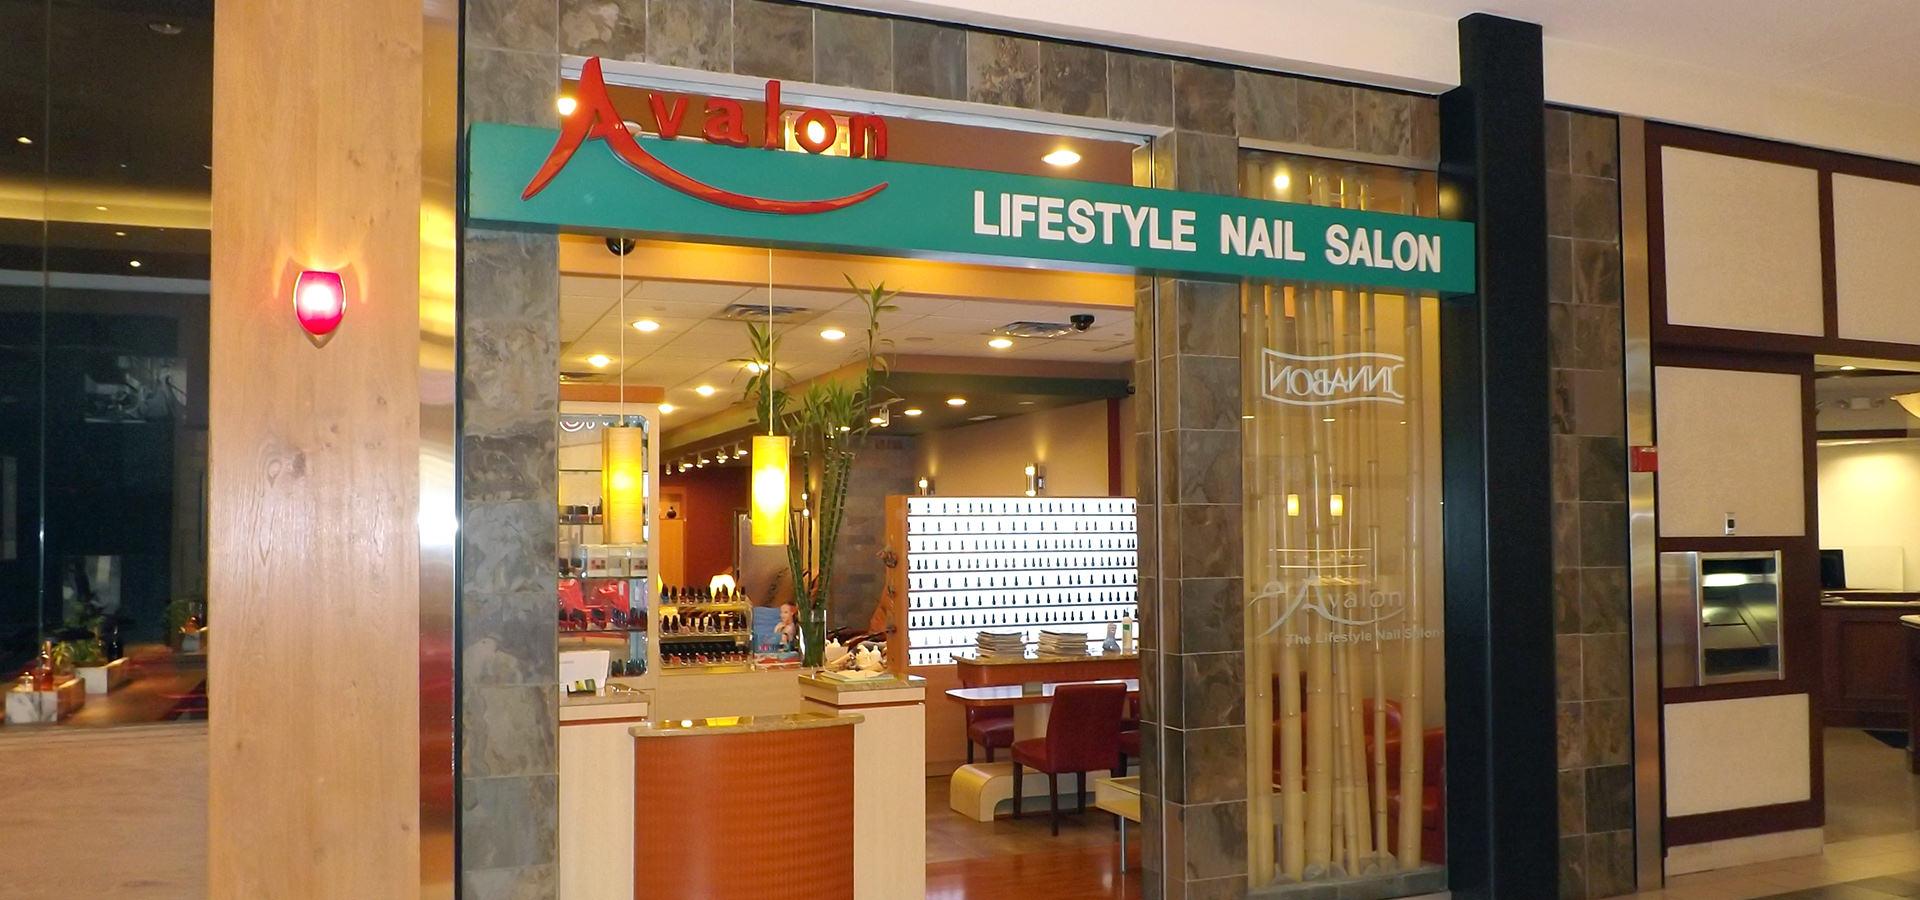 Avalon Lifestyle Nail Salon & Spa in Dulles, VA | Dulles ...